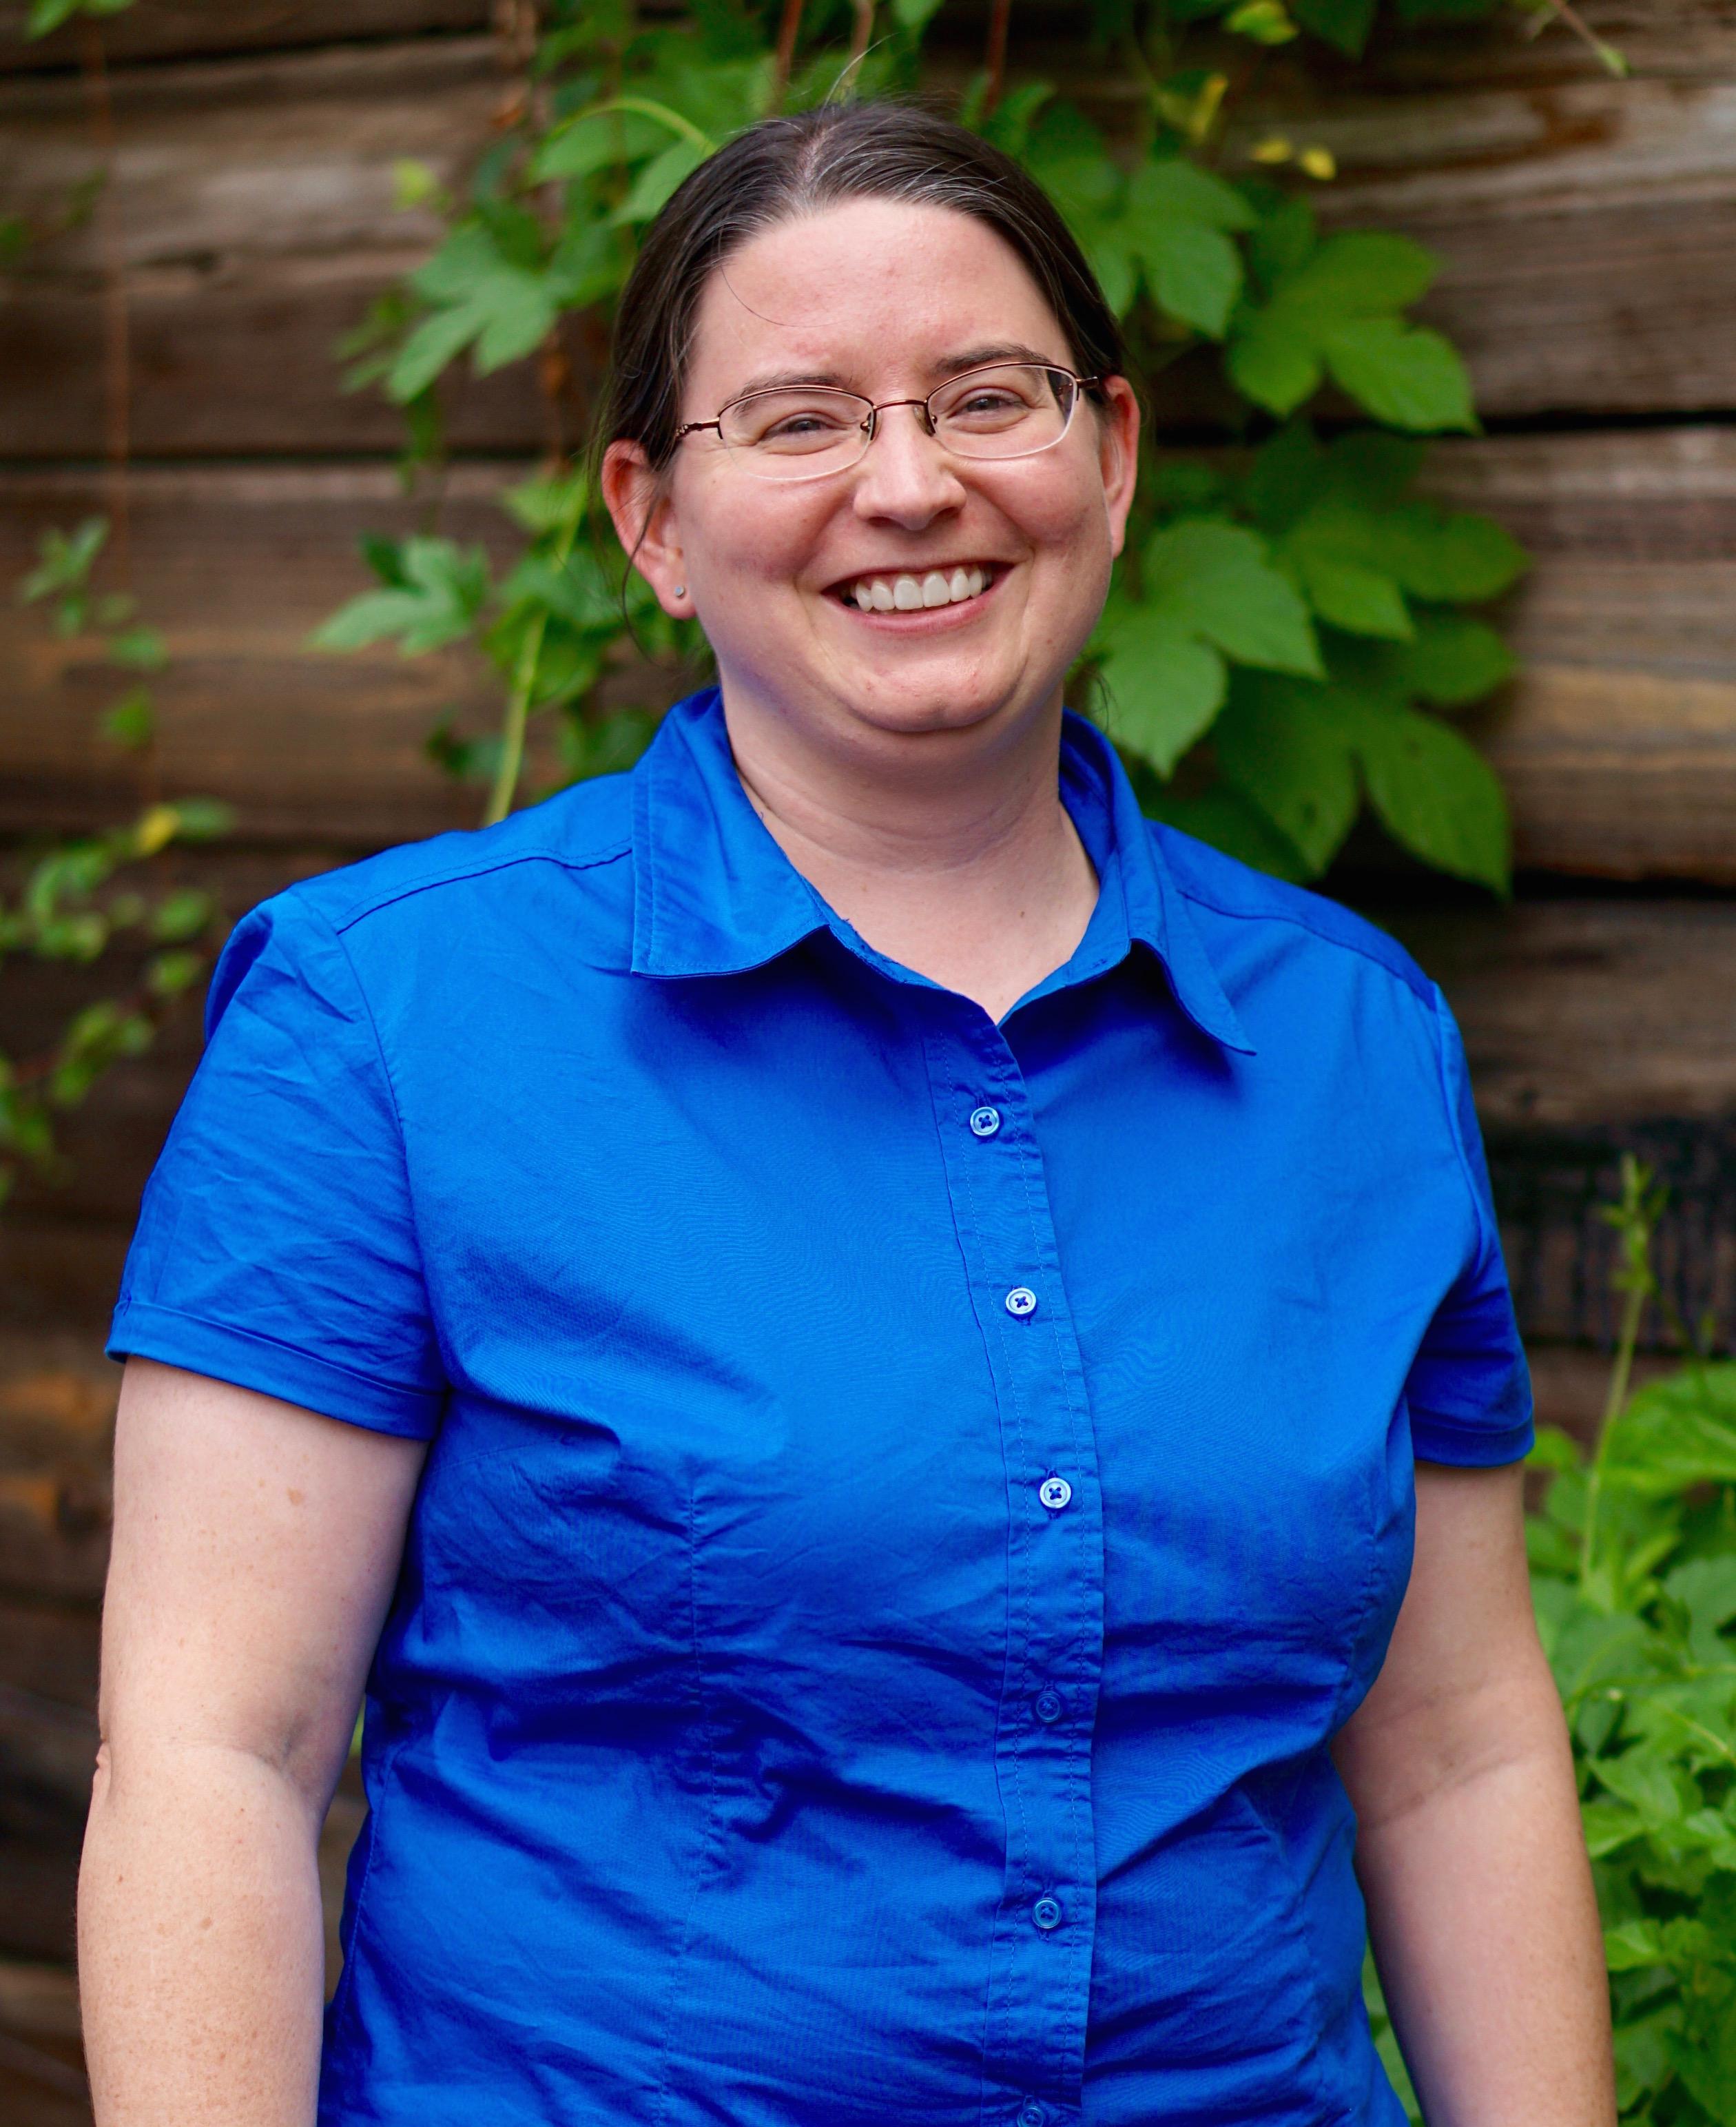 Mackenzie L. Taylor, BA, PhD